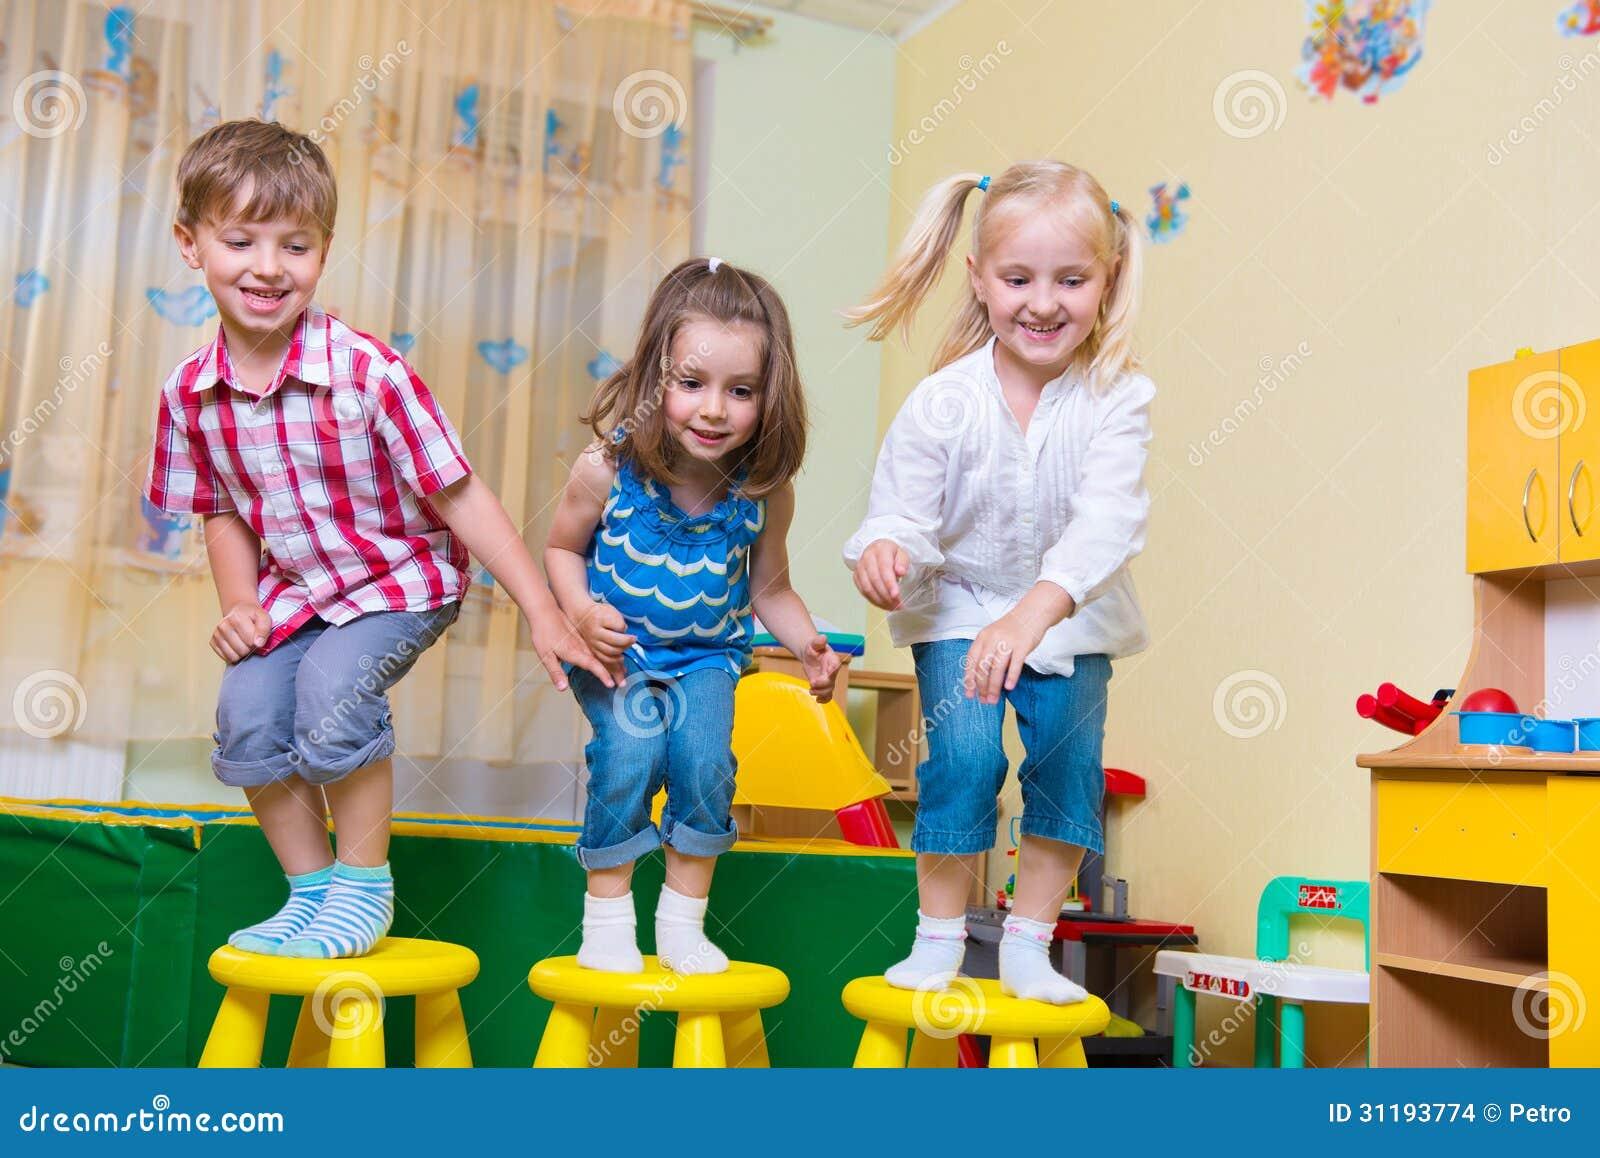 Worksheet Preschool Kindergarten group of happy preschool kids jumping stock images image 31193774 jumping